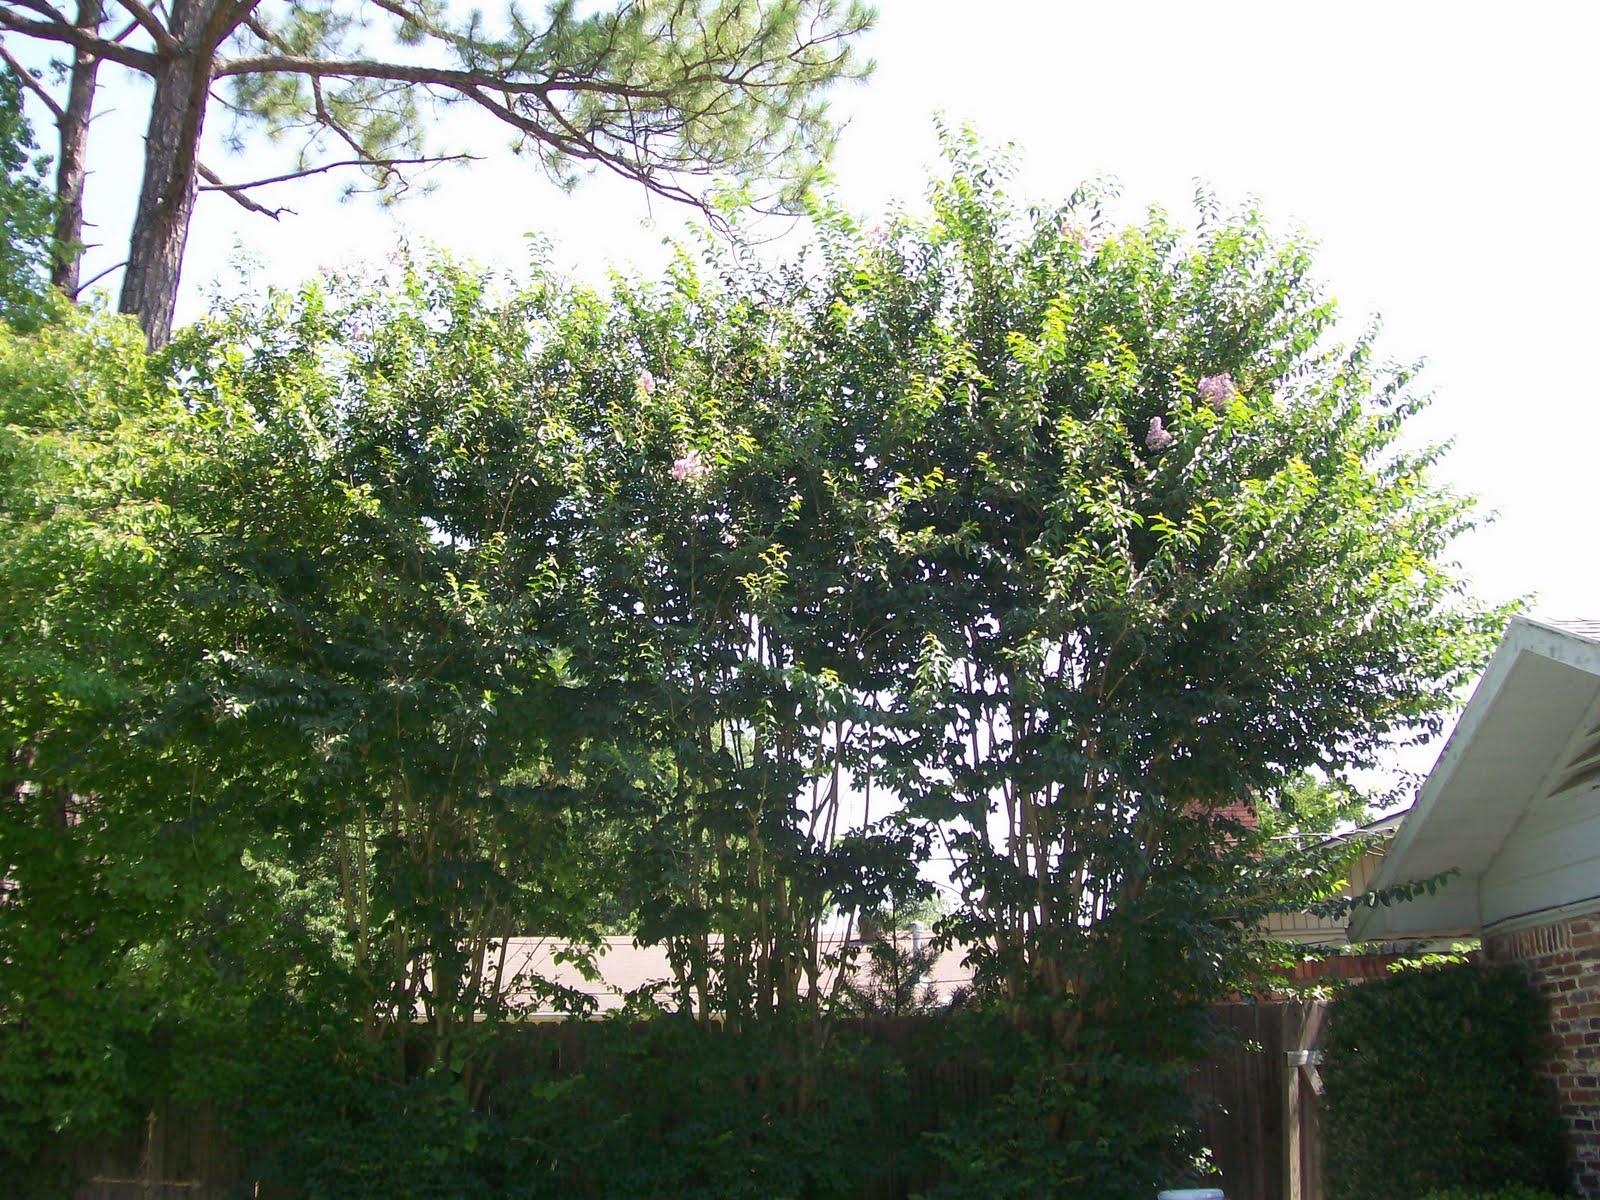 Rockhounding Around: Crepe Myrtle